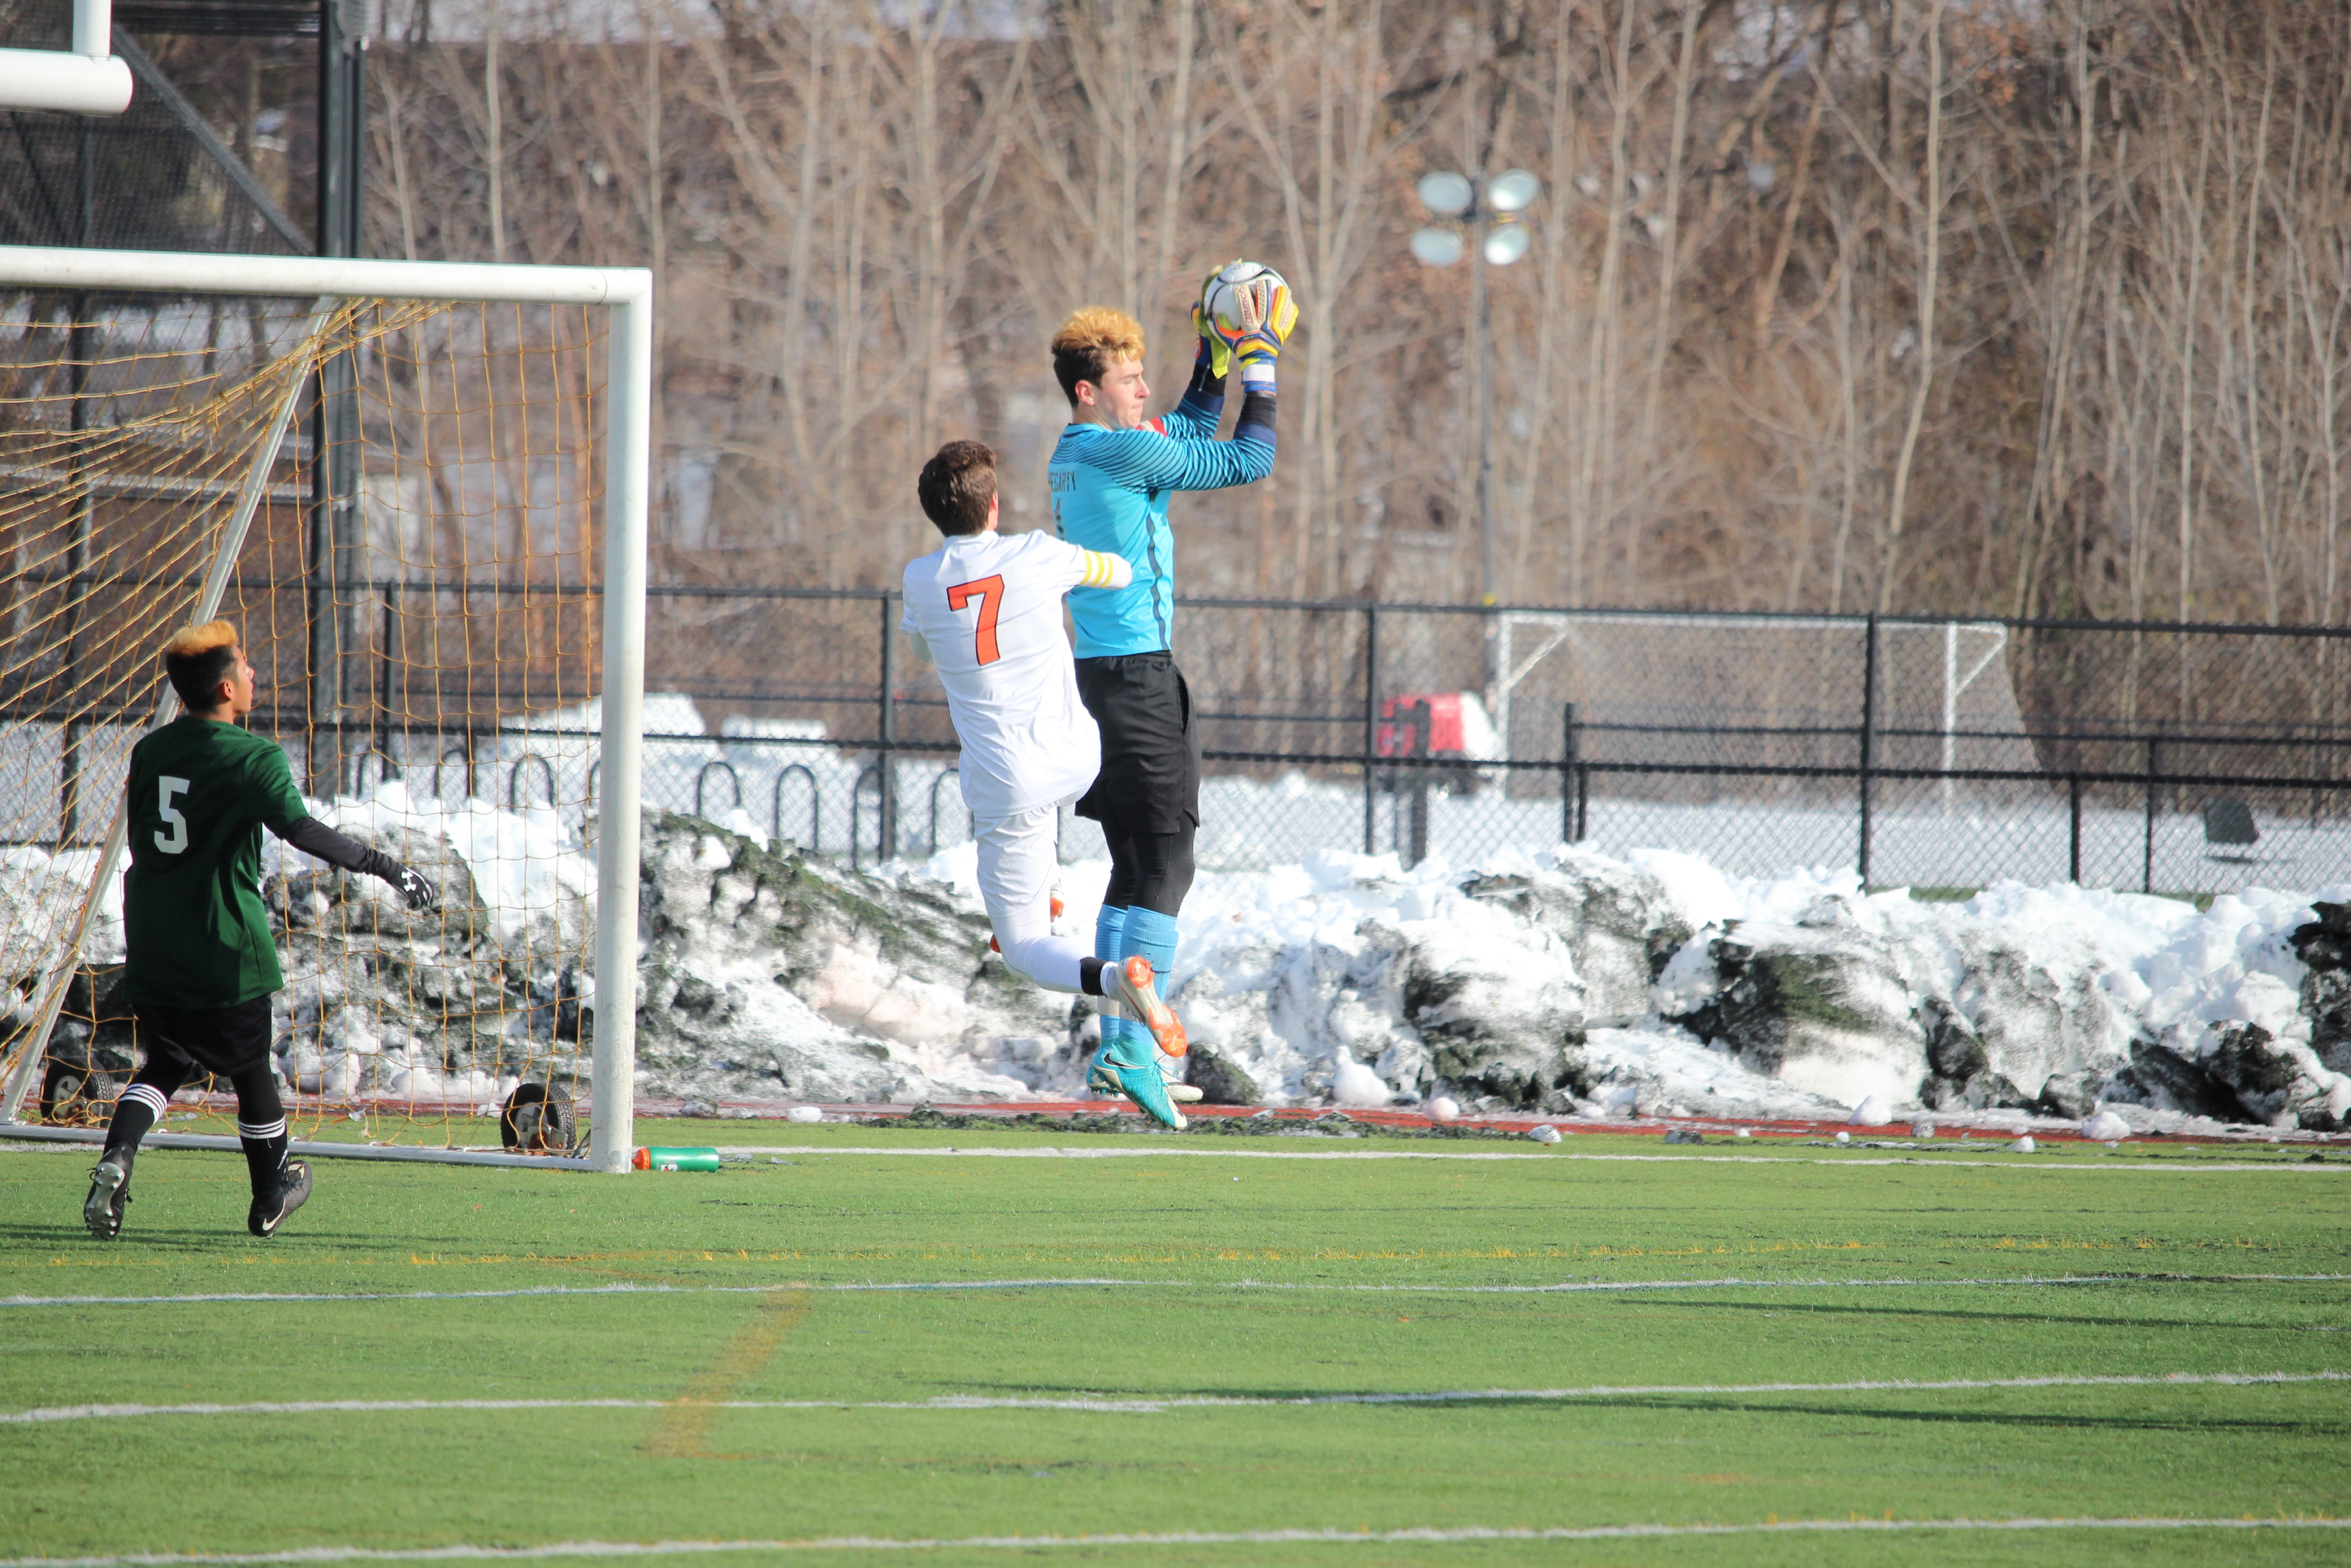 Senior+captain+Andrew+D%27Amico+jumps+to+challenge+the+Nipmuc+goalie.